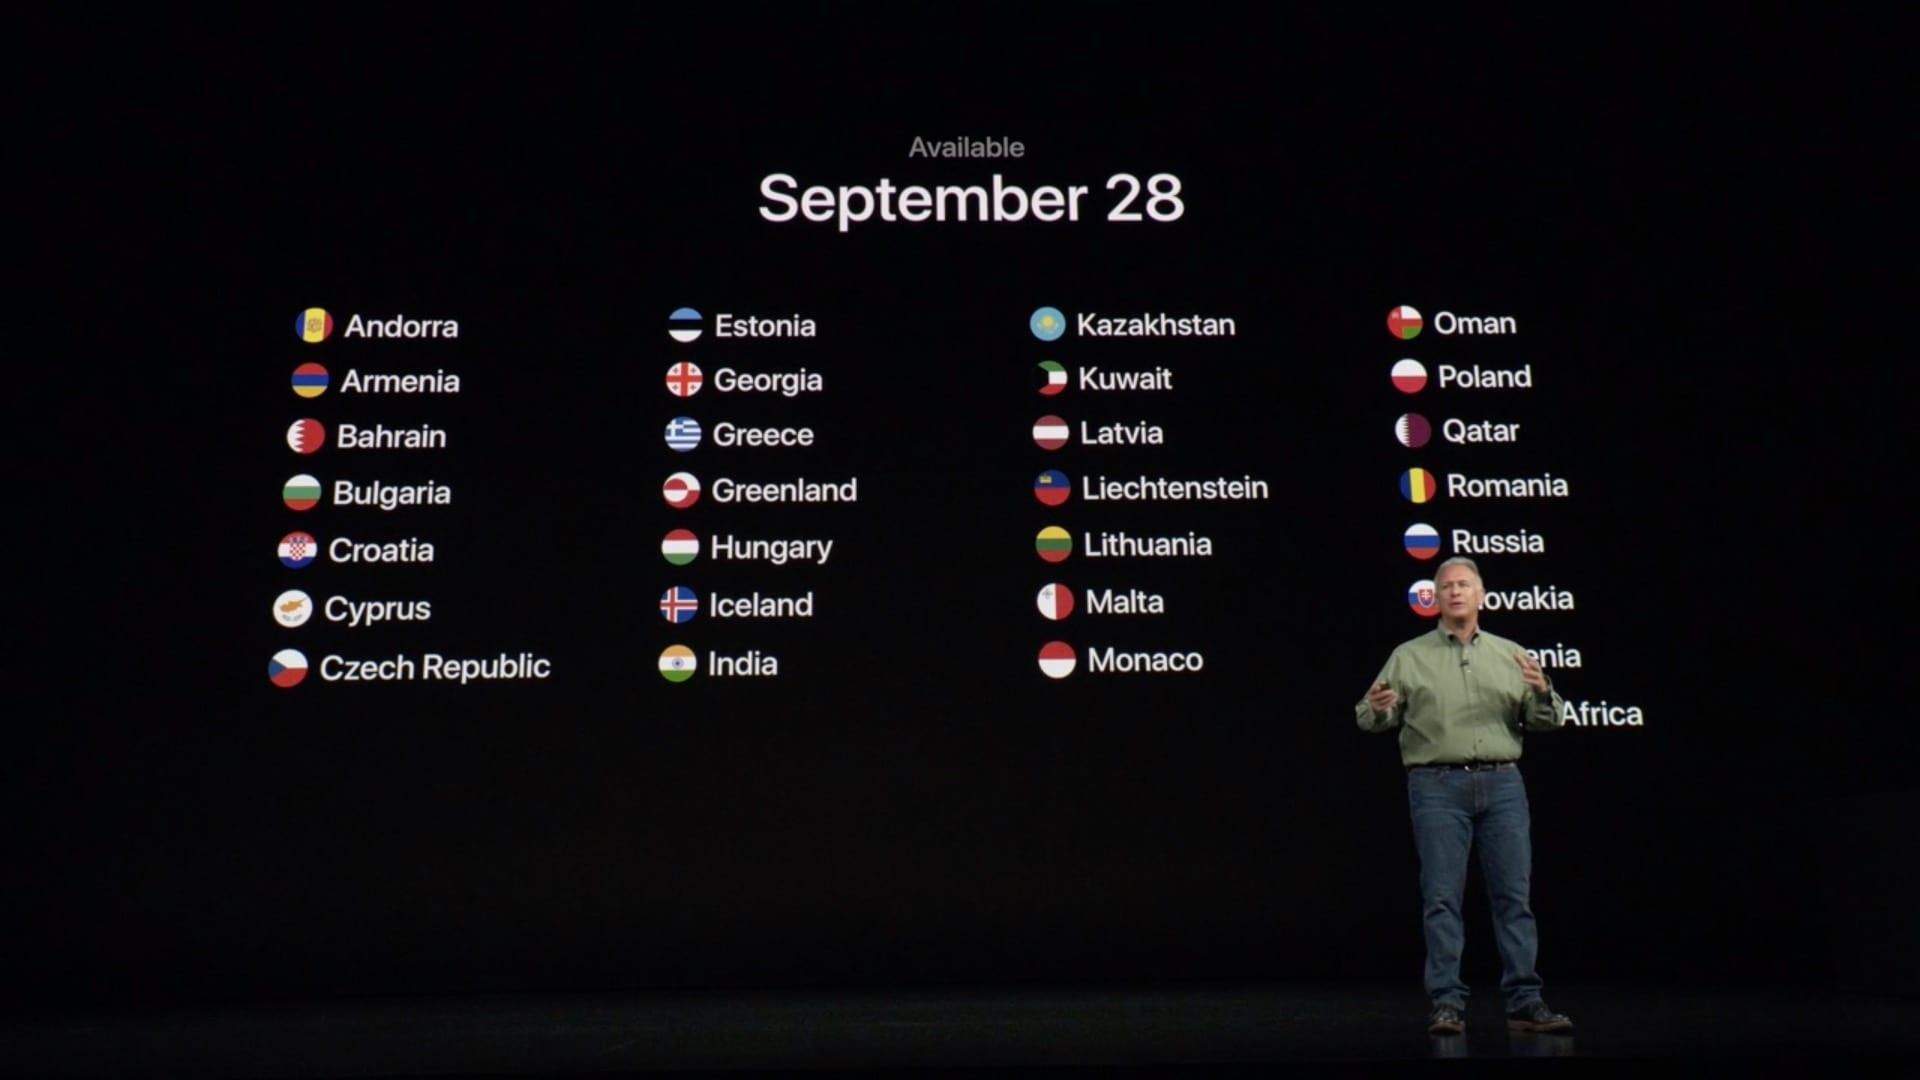 iphone xs dostupnost - Apple predstavil iPhone XS a obrovský iPhone XS Max